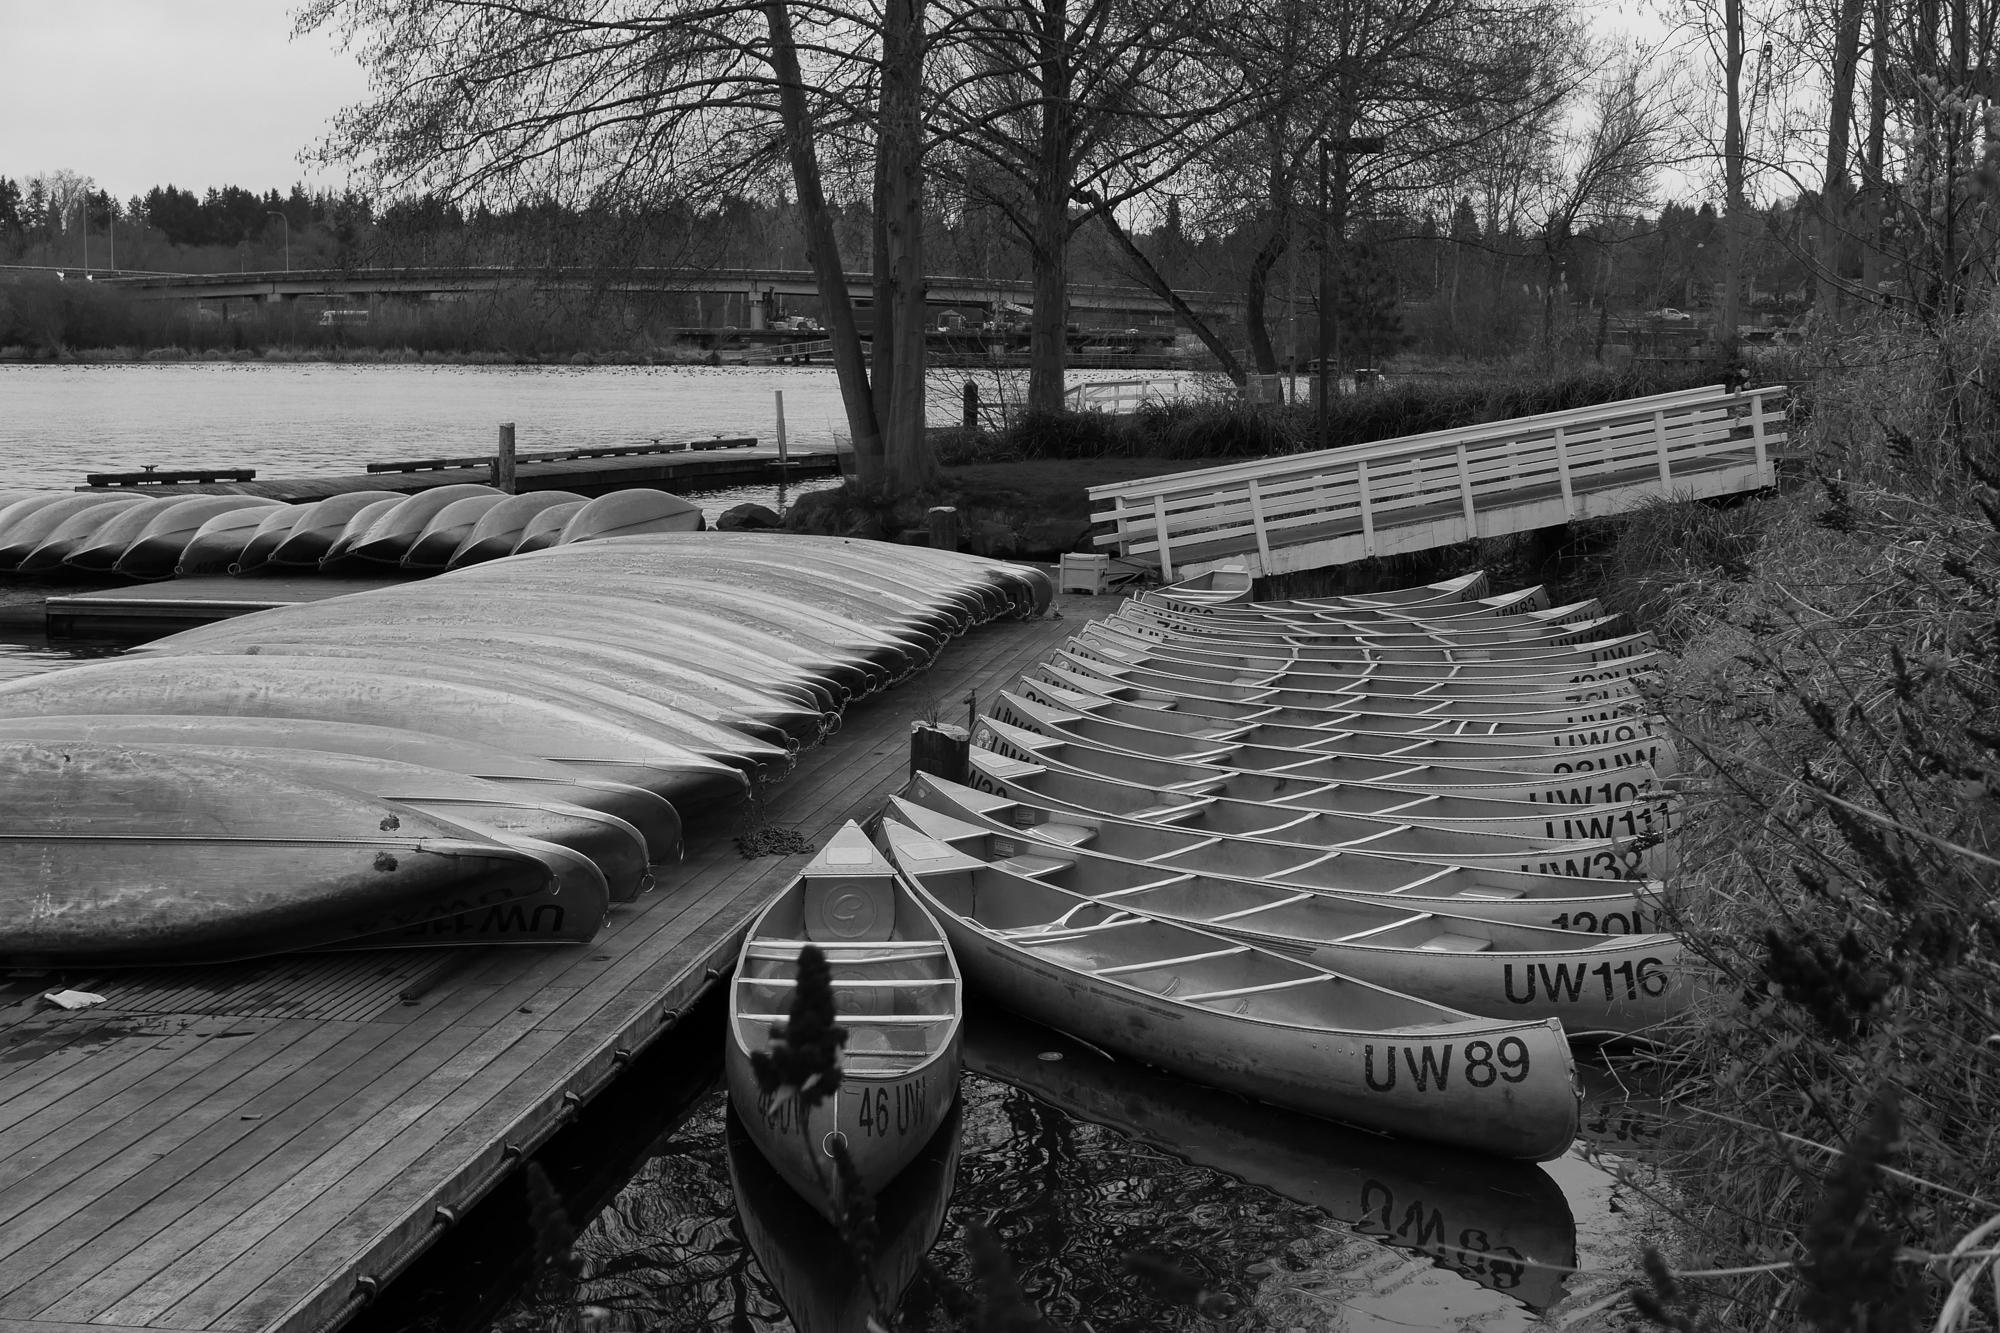 Rental canoes, Lake Washington